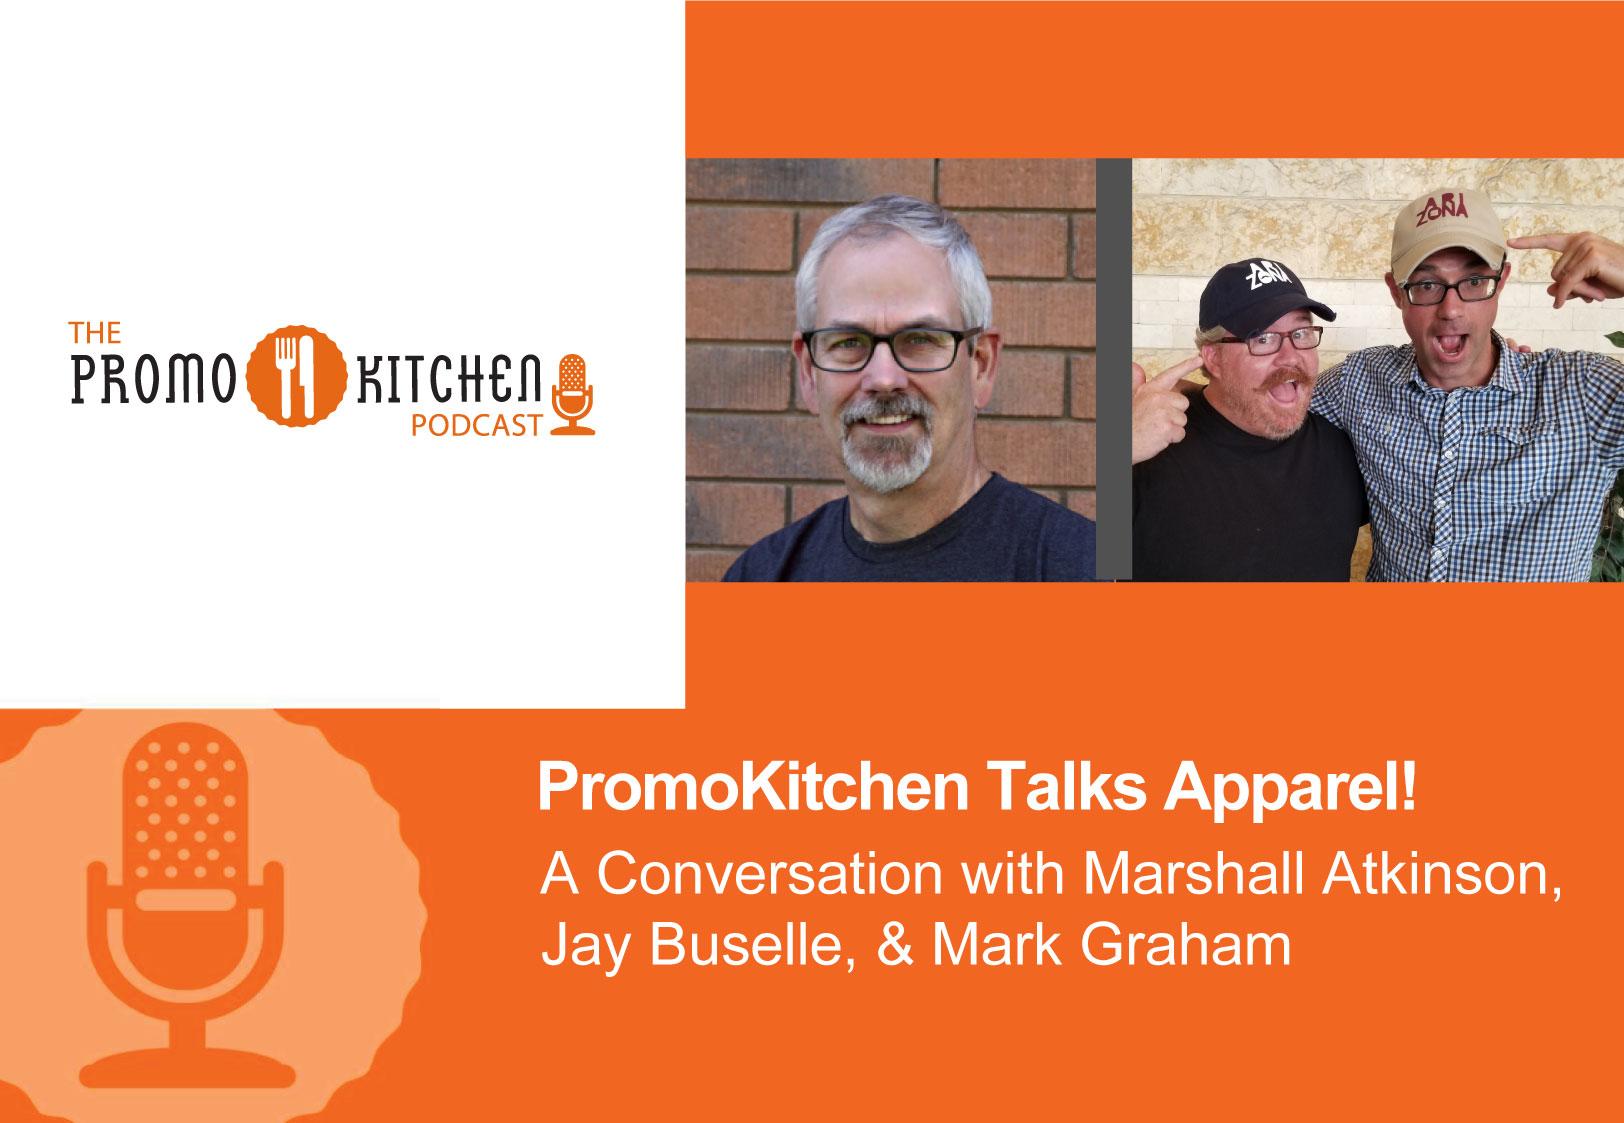 PromoKitchen-Apparel-Podcast.jpg